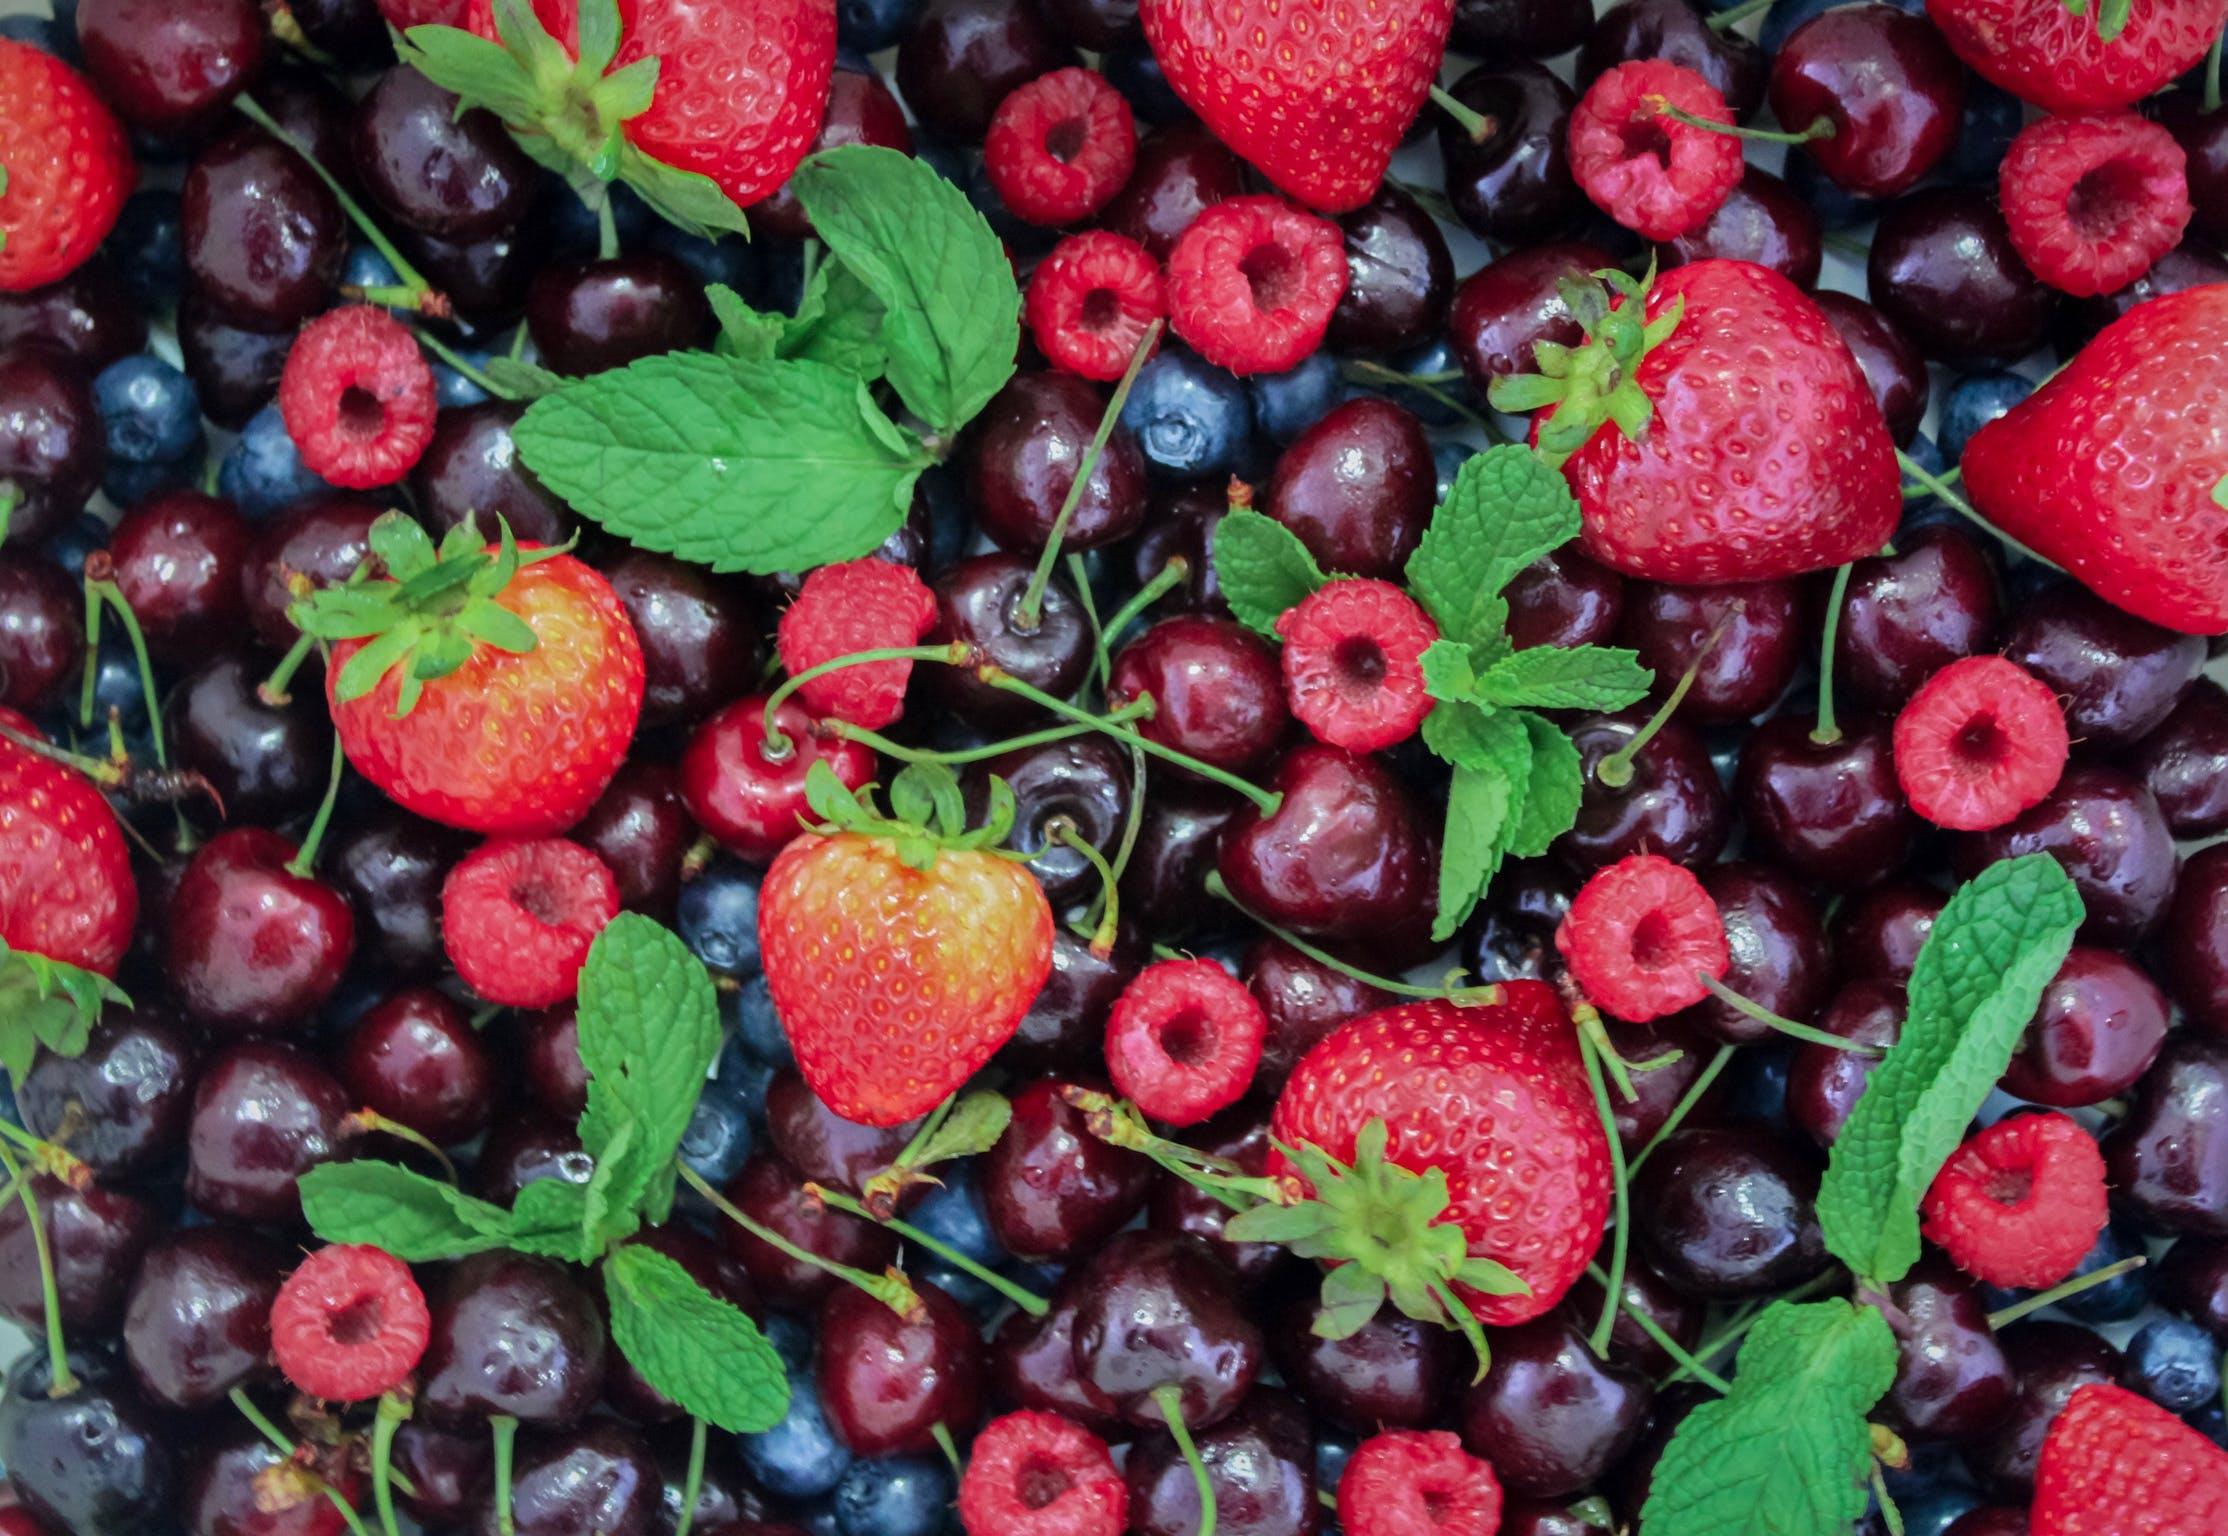 Free stock photo of food, fruits, blueberries, raspberries